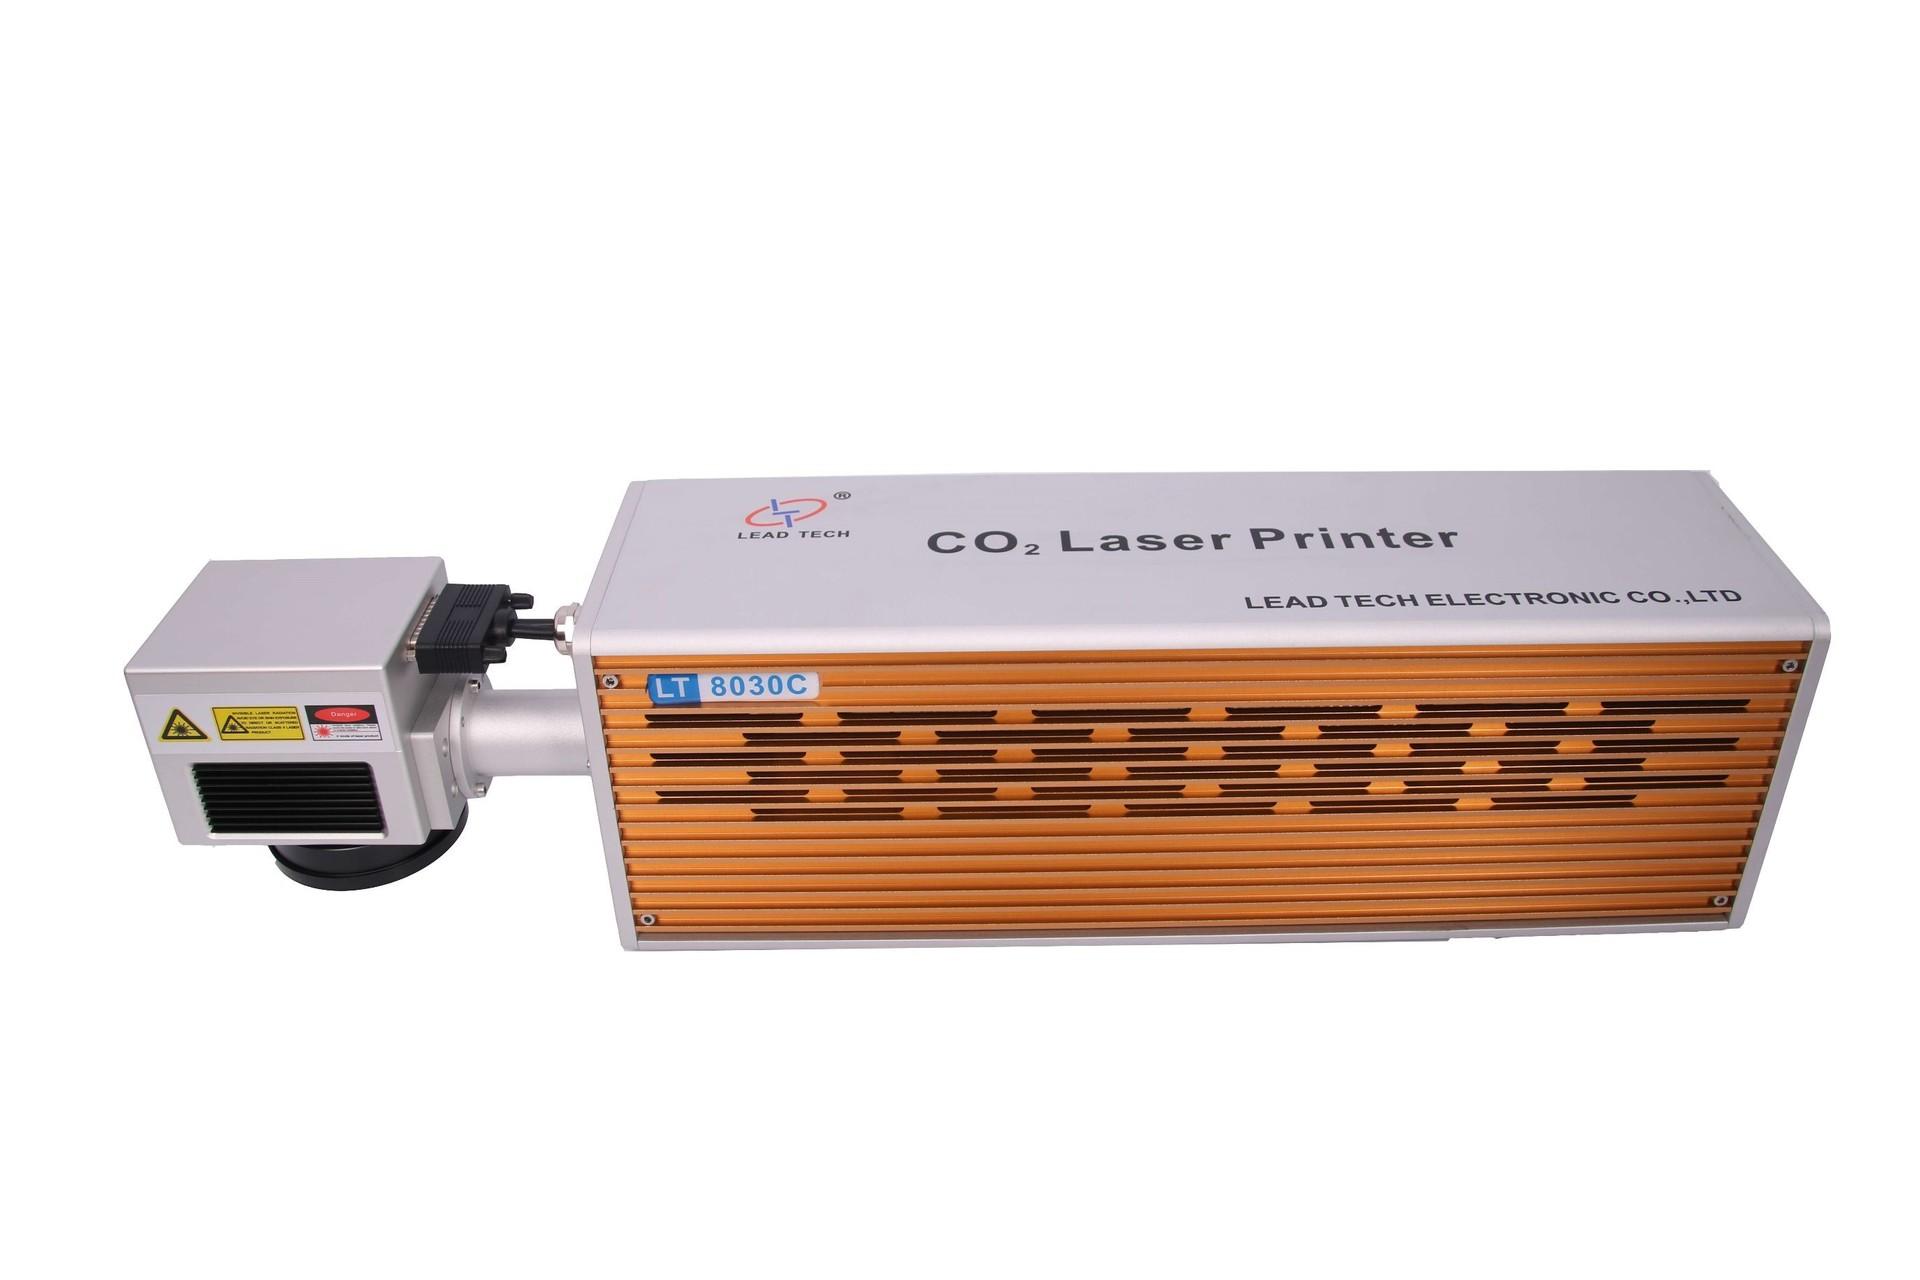 Lt8015c/Lt8030c CO2 High Performance Economic Laser Marking Printer